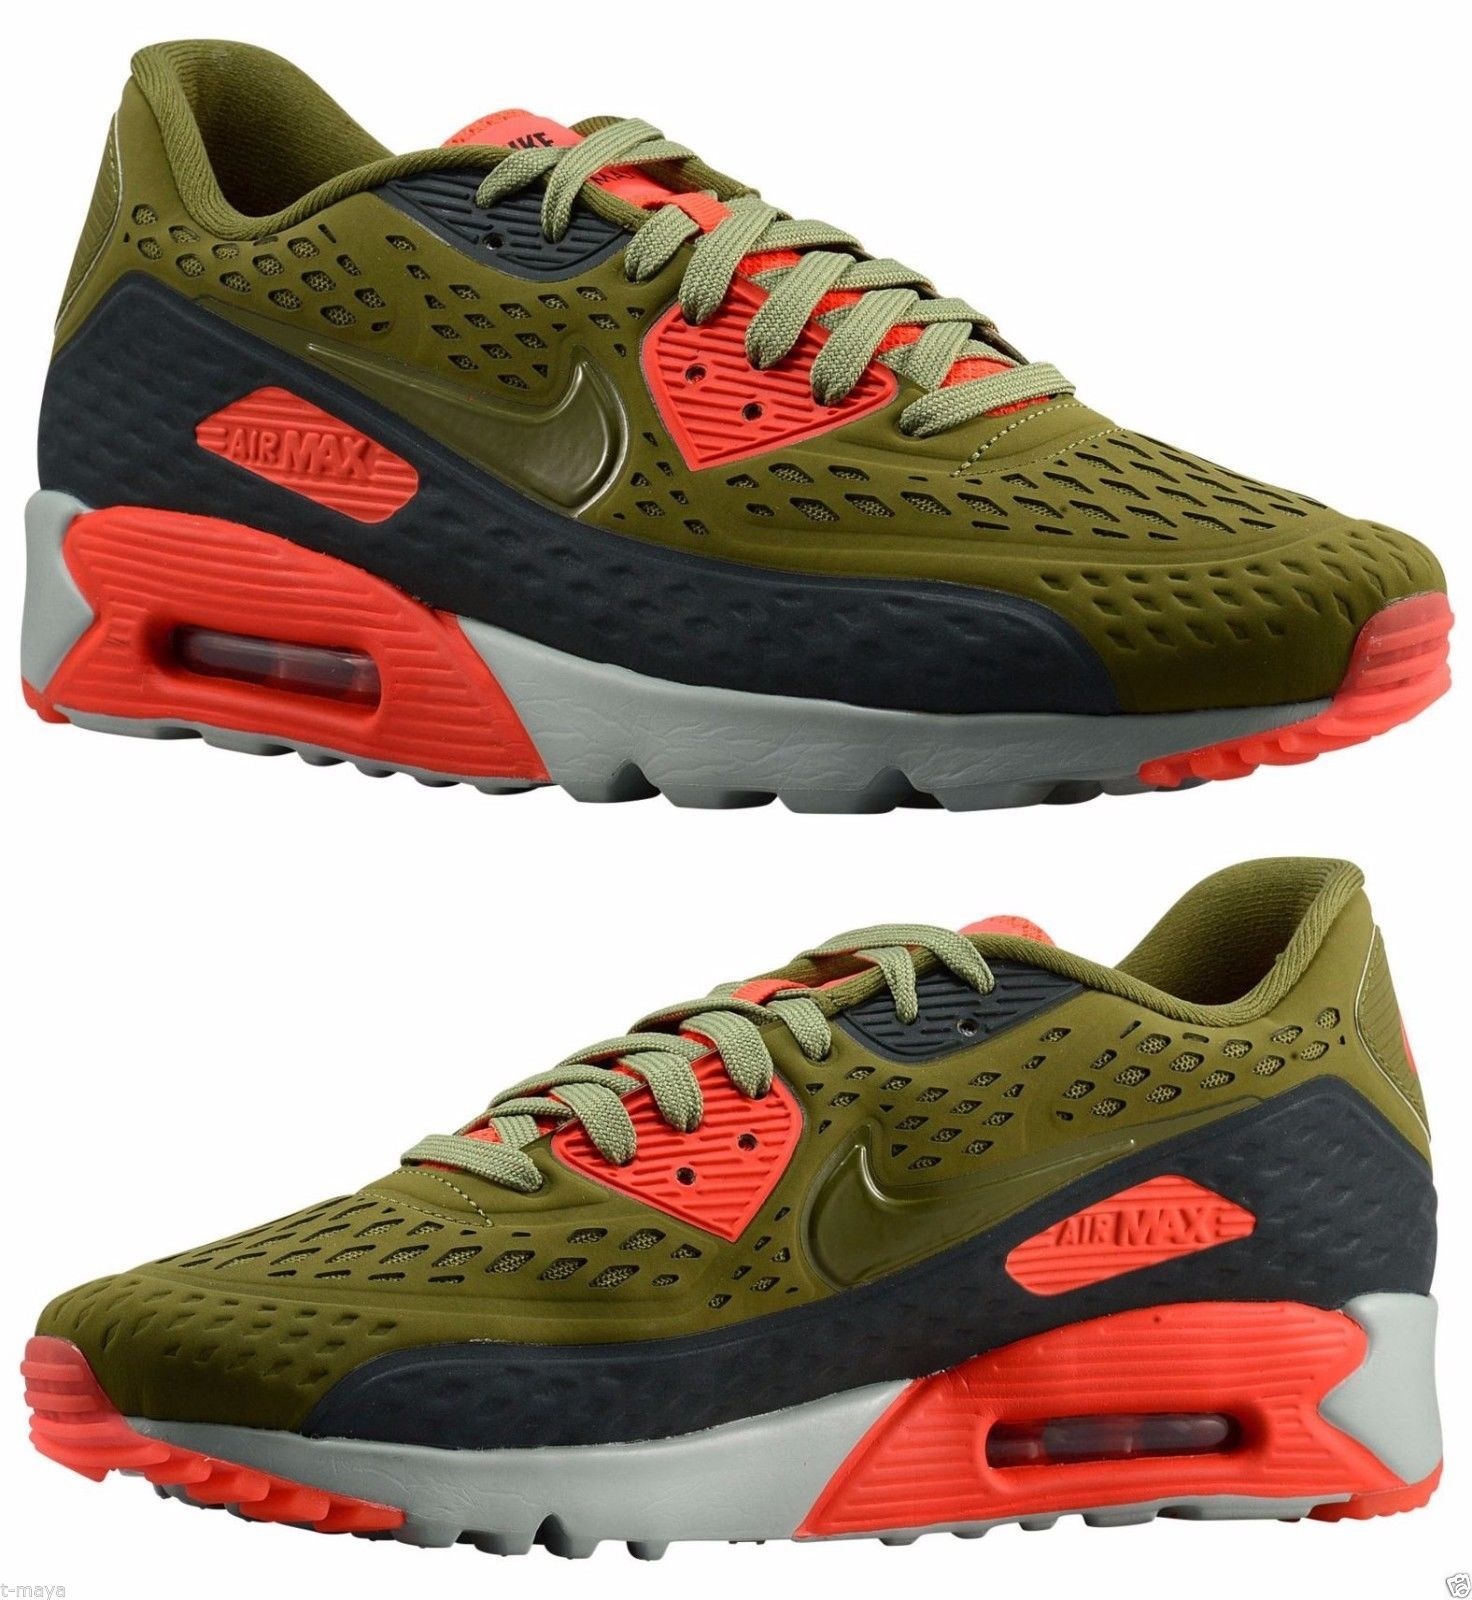 nike shox pour les filles - Nike air max 90 premium ale brown midnight navy 700155 201 | Nike ...